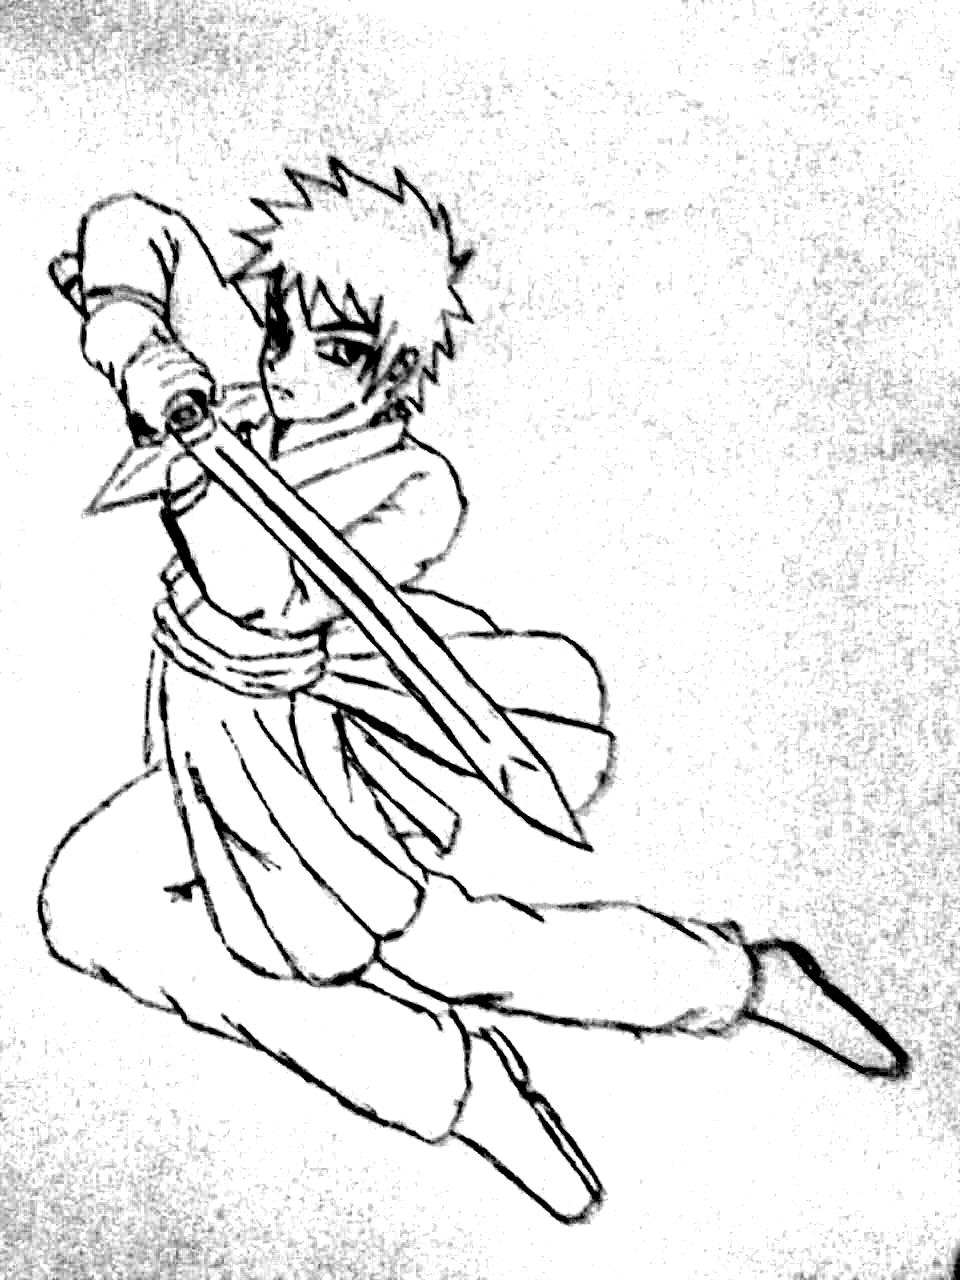 Oke selamat sore mina sore kali ini saya akan membagi tutorial cara mewarnai gambar anime di photoshop selamat menyimak